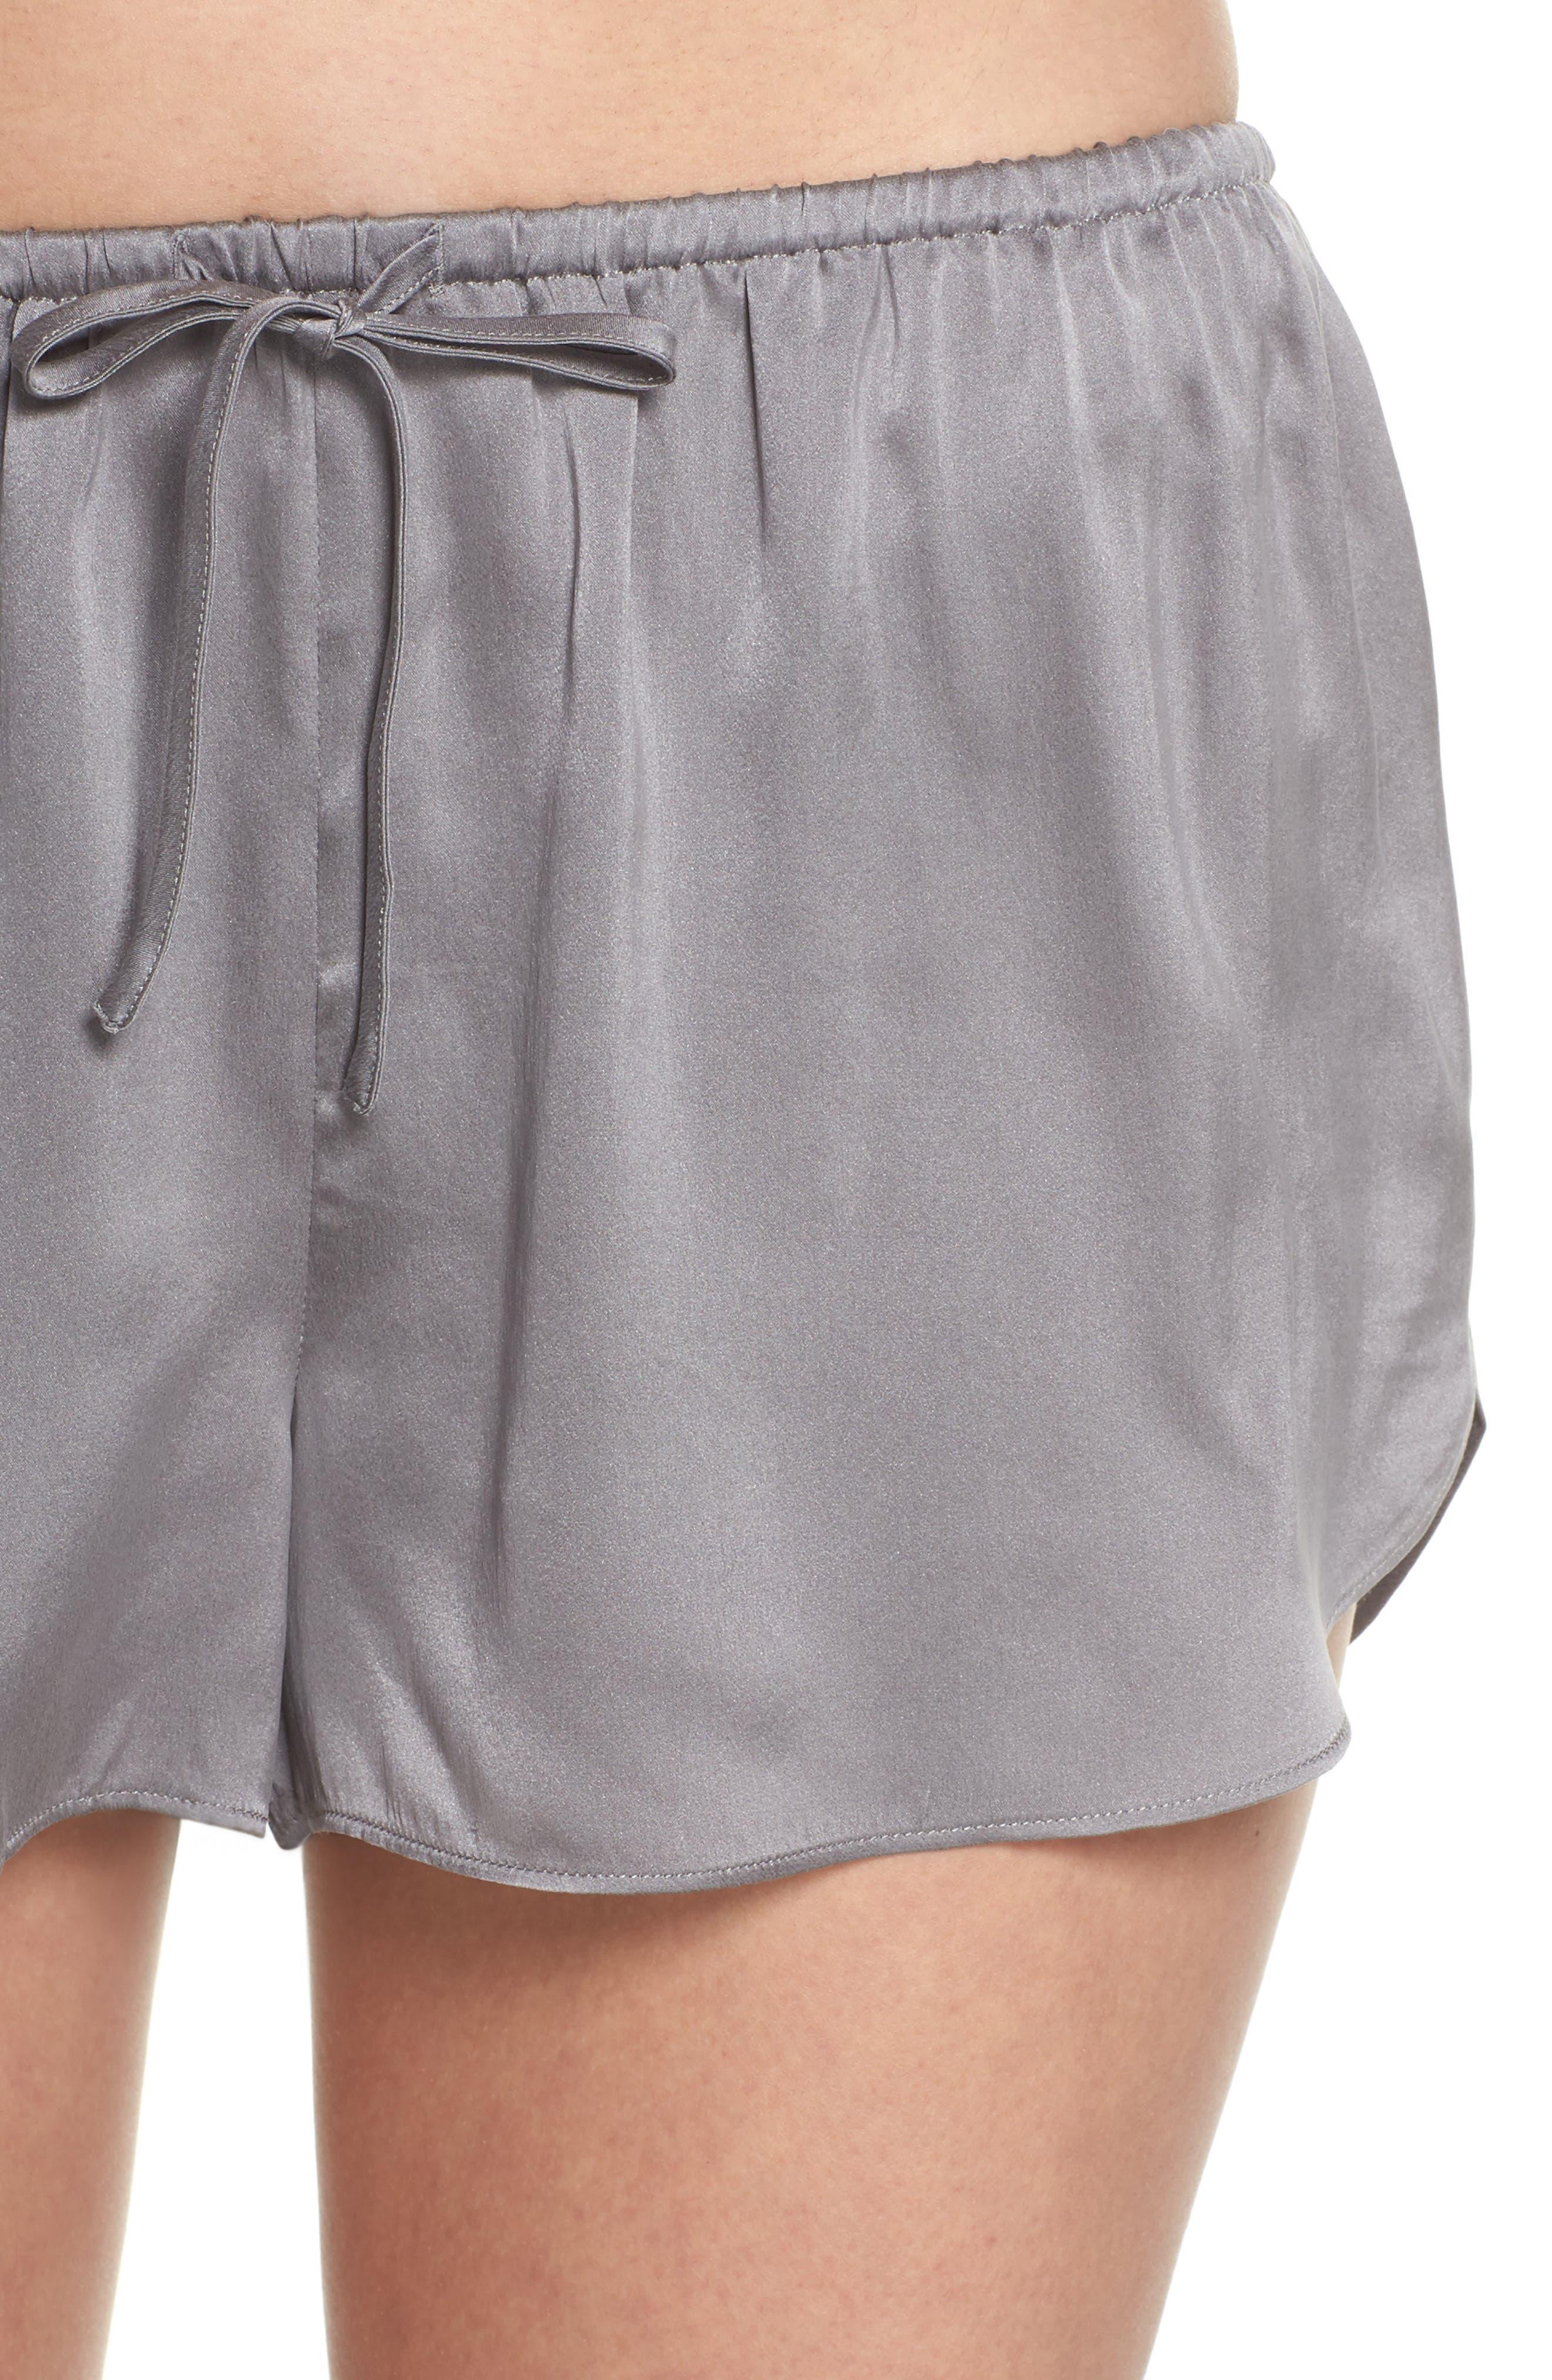 Short Silk Pajamas,                             Alternate thumbnail 4, color,                             Charcoal